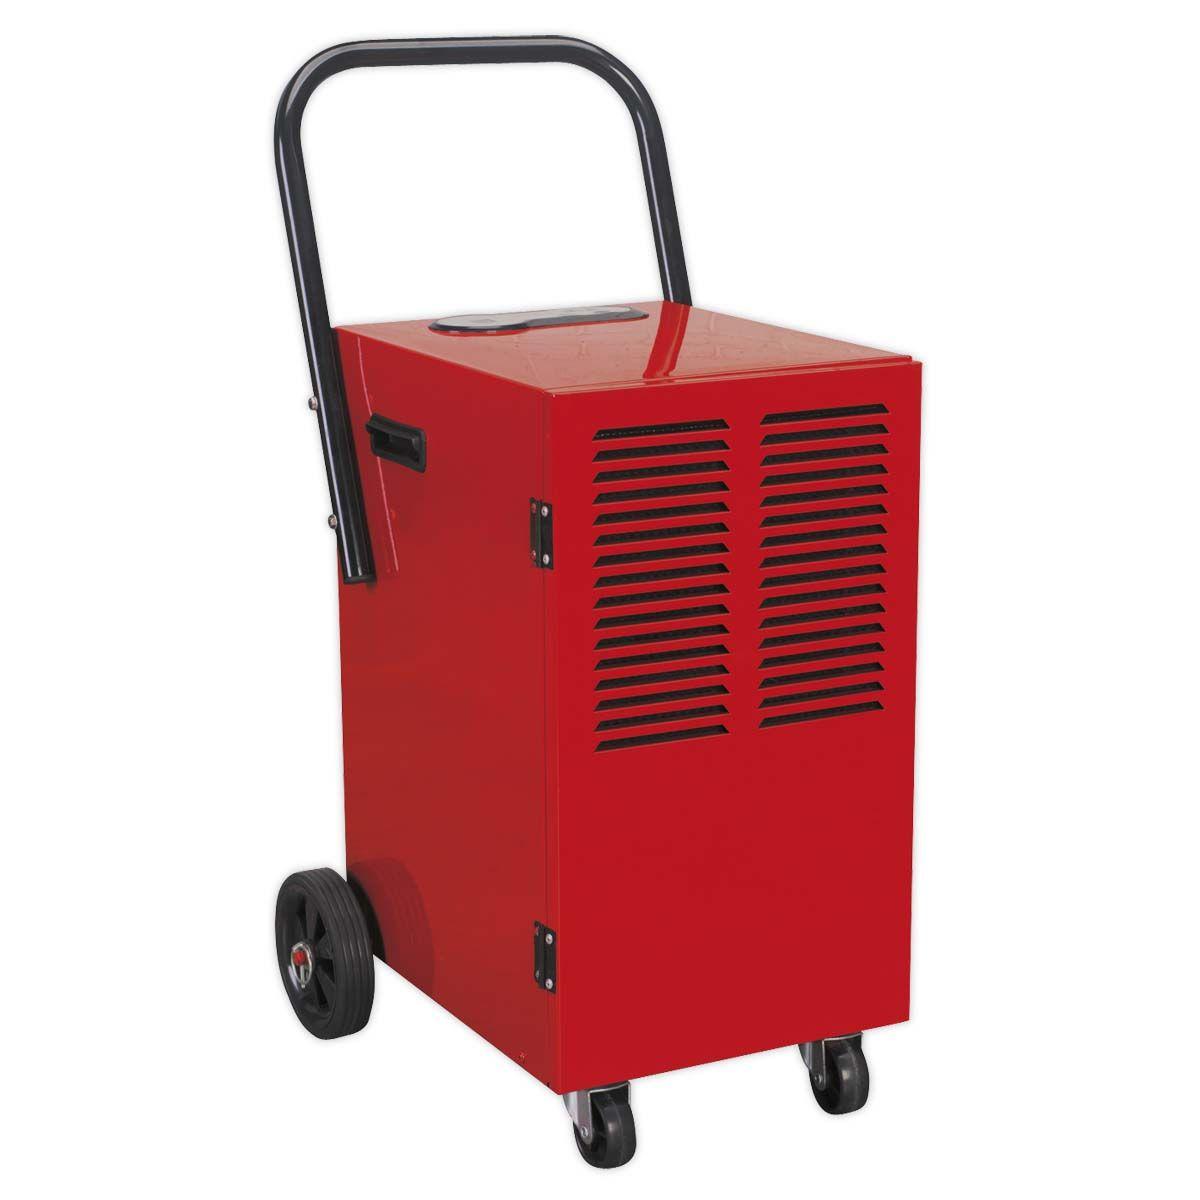 Sealey Industrial Dehumidifier 50L